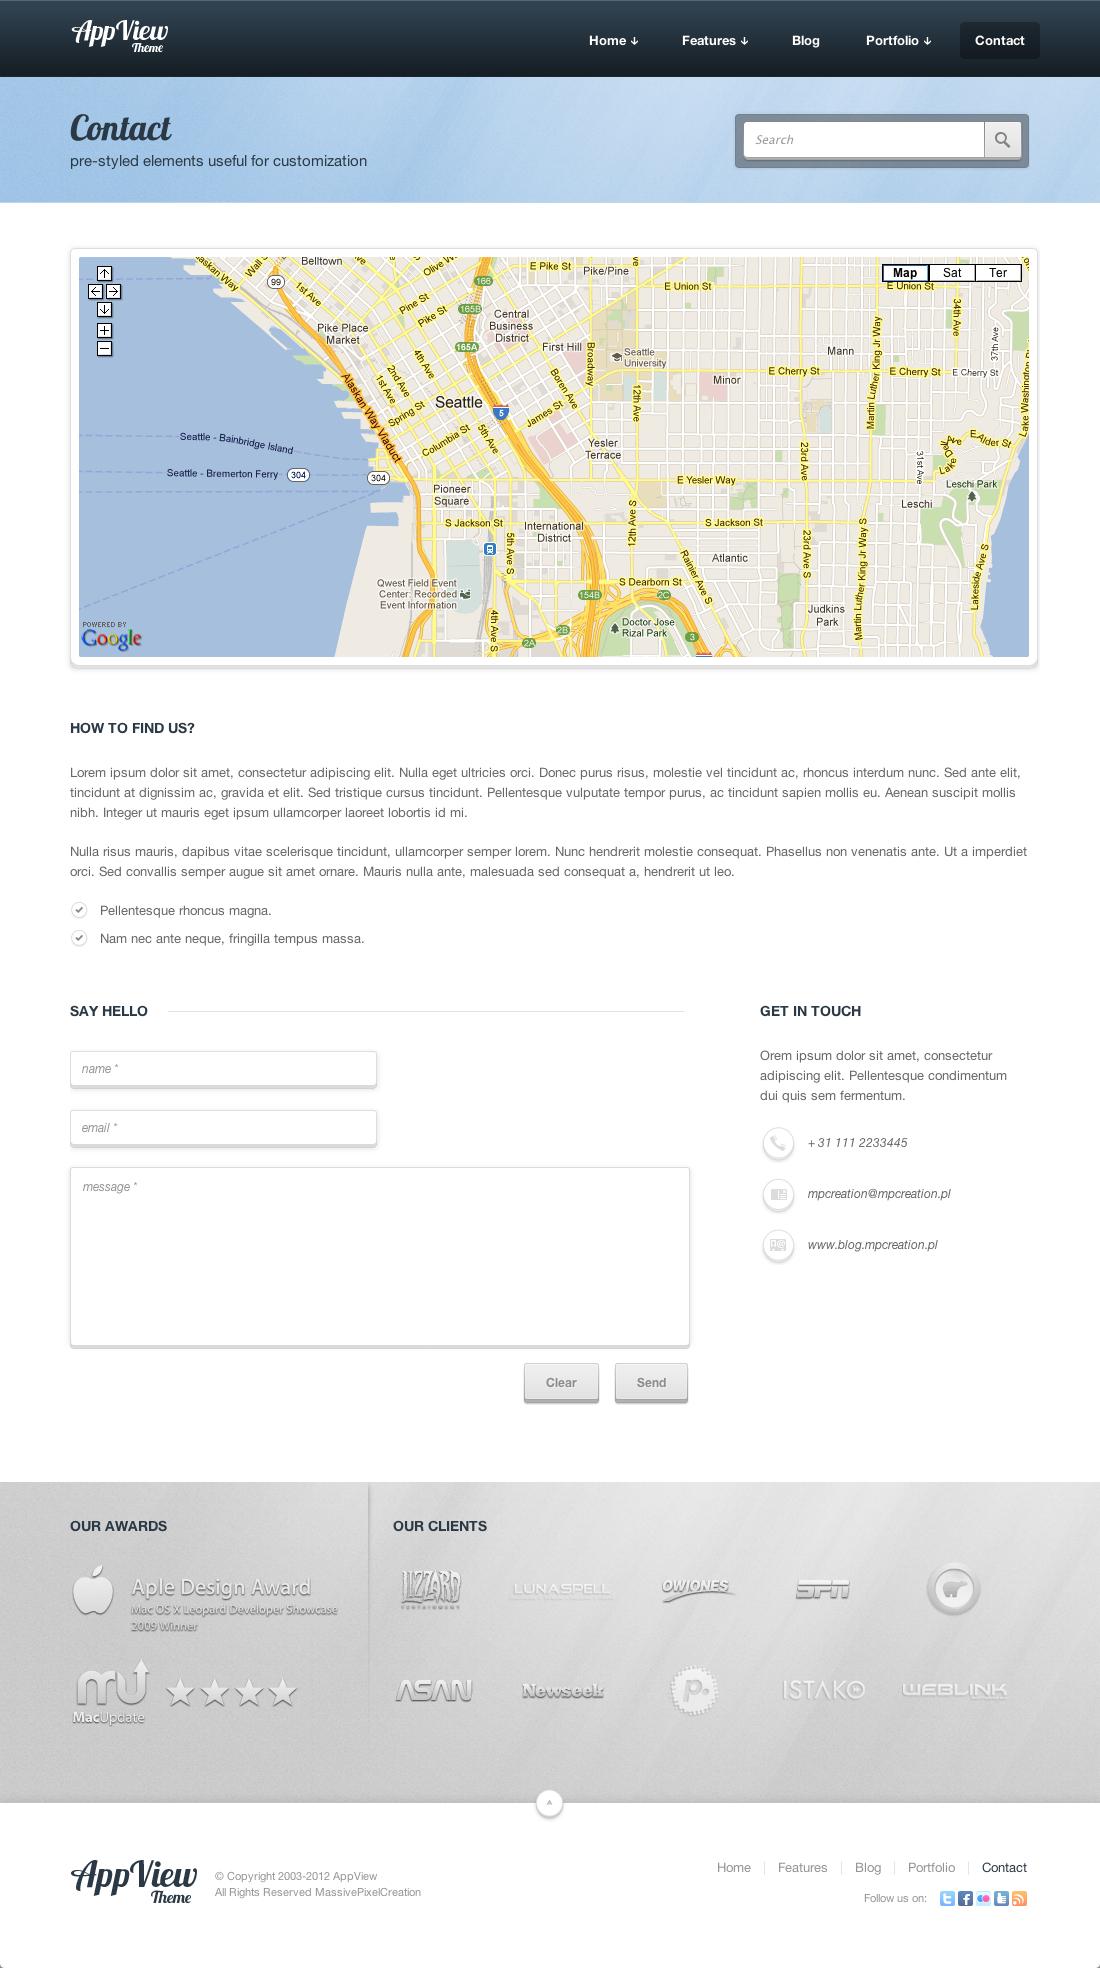 AppView Professional Portfolio WordPress Theme - Screenshot 1 - Contact Page